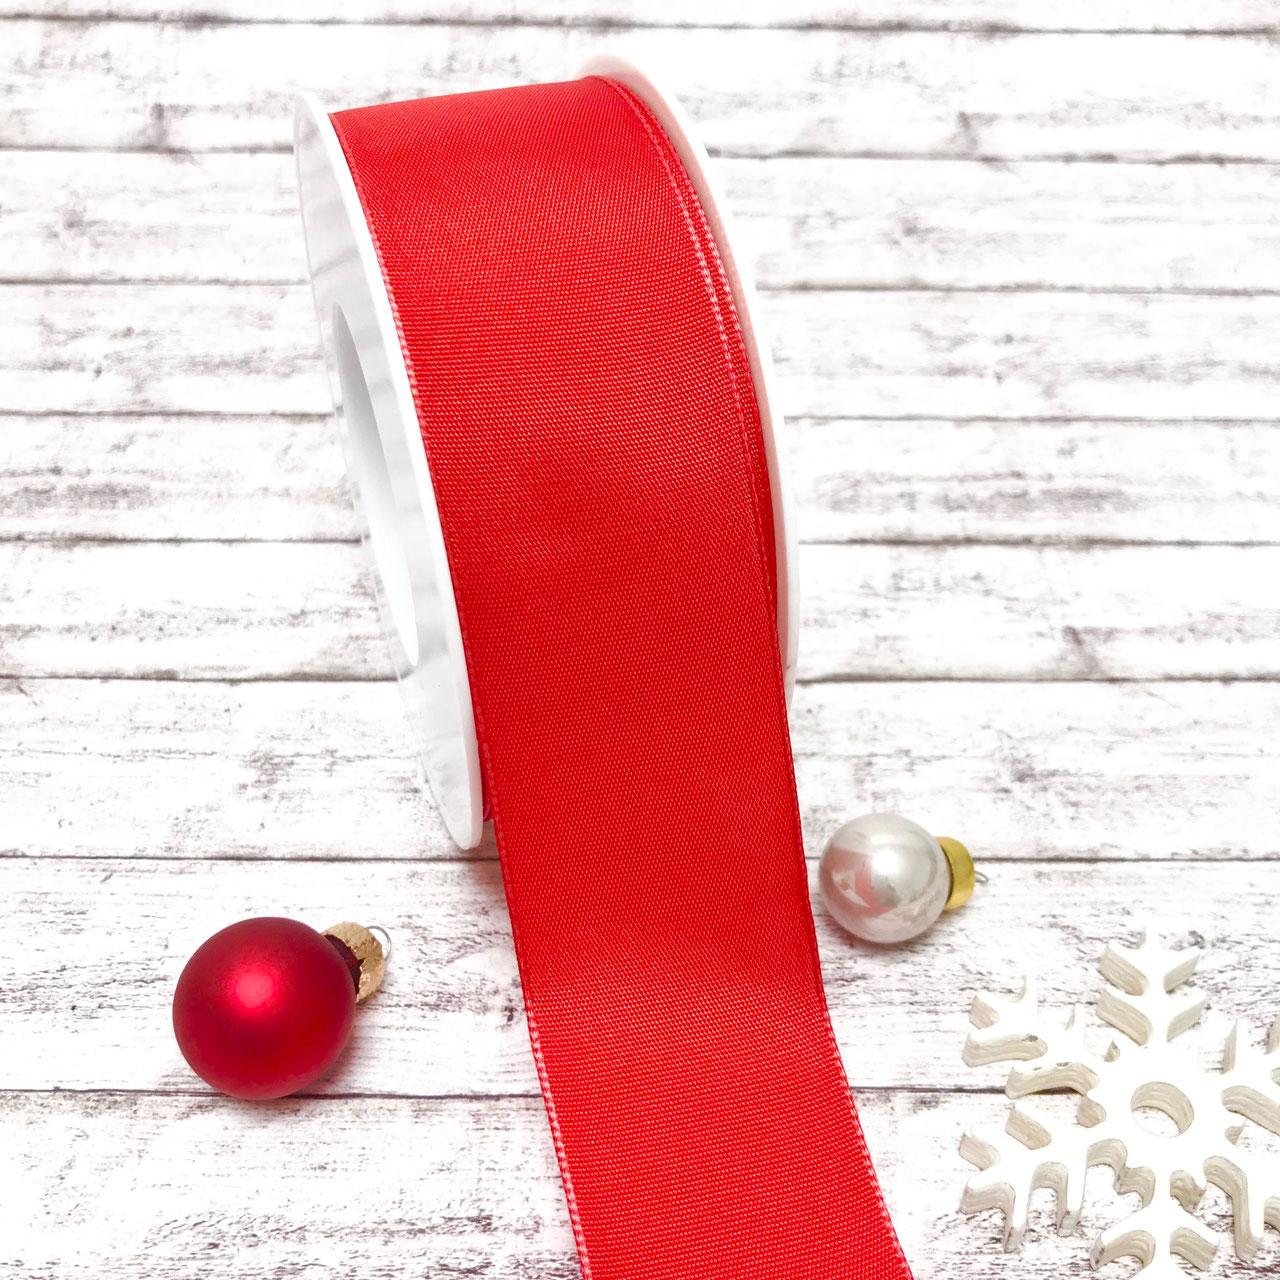 Drahtband - Geschenkband - Ribbon - Der Schachtel Shop München